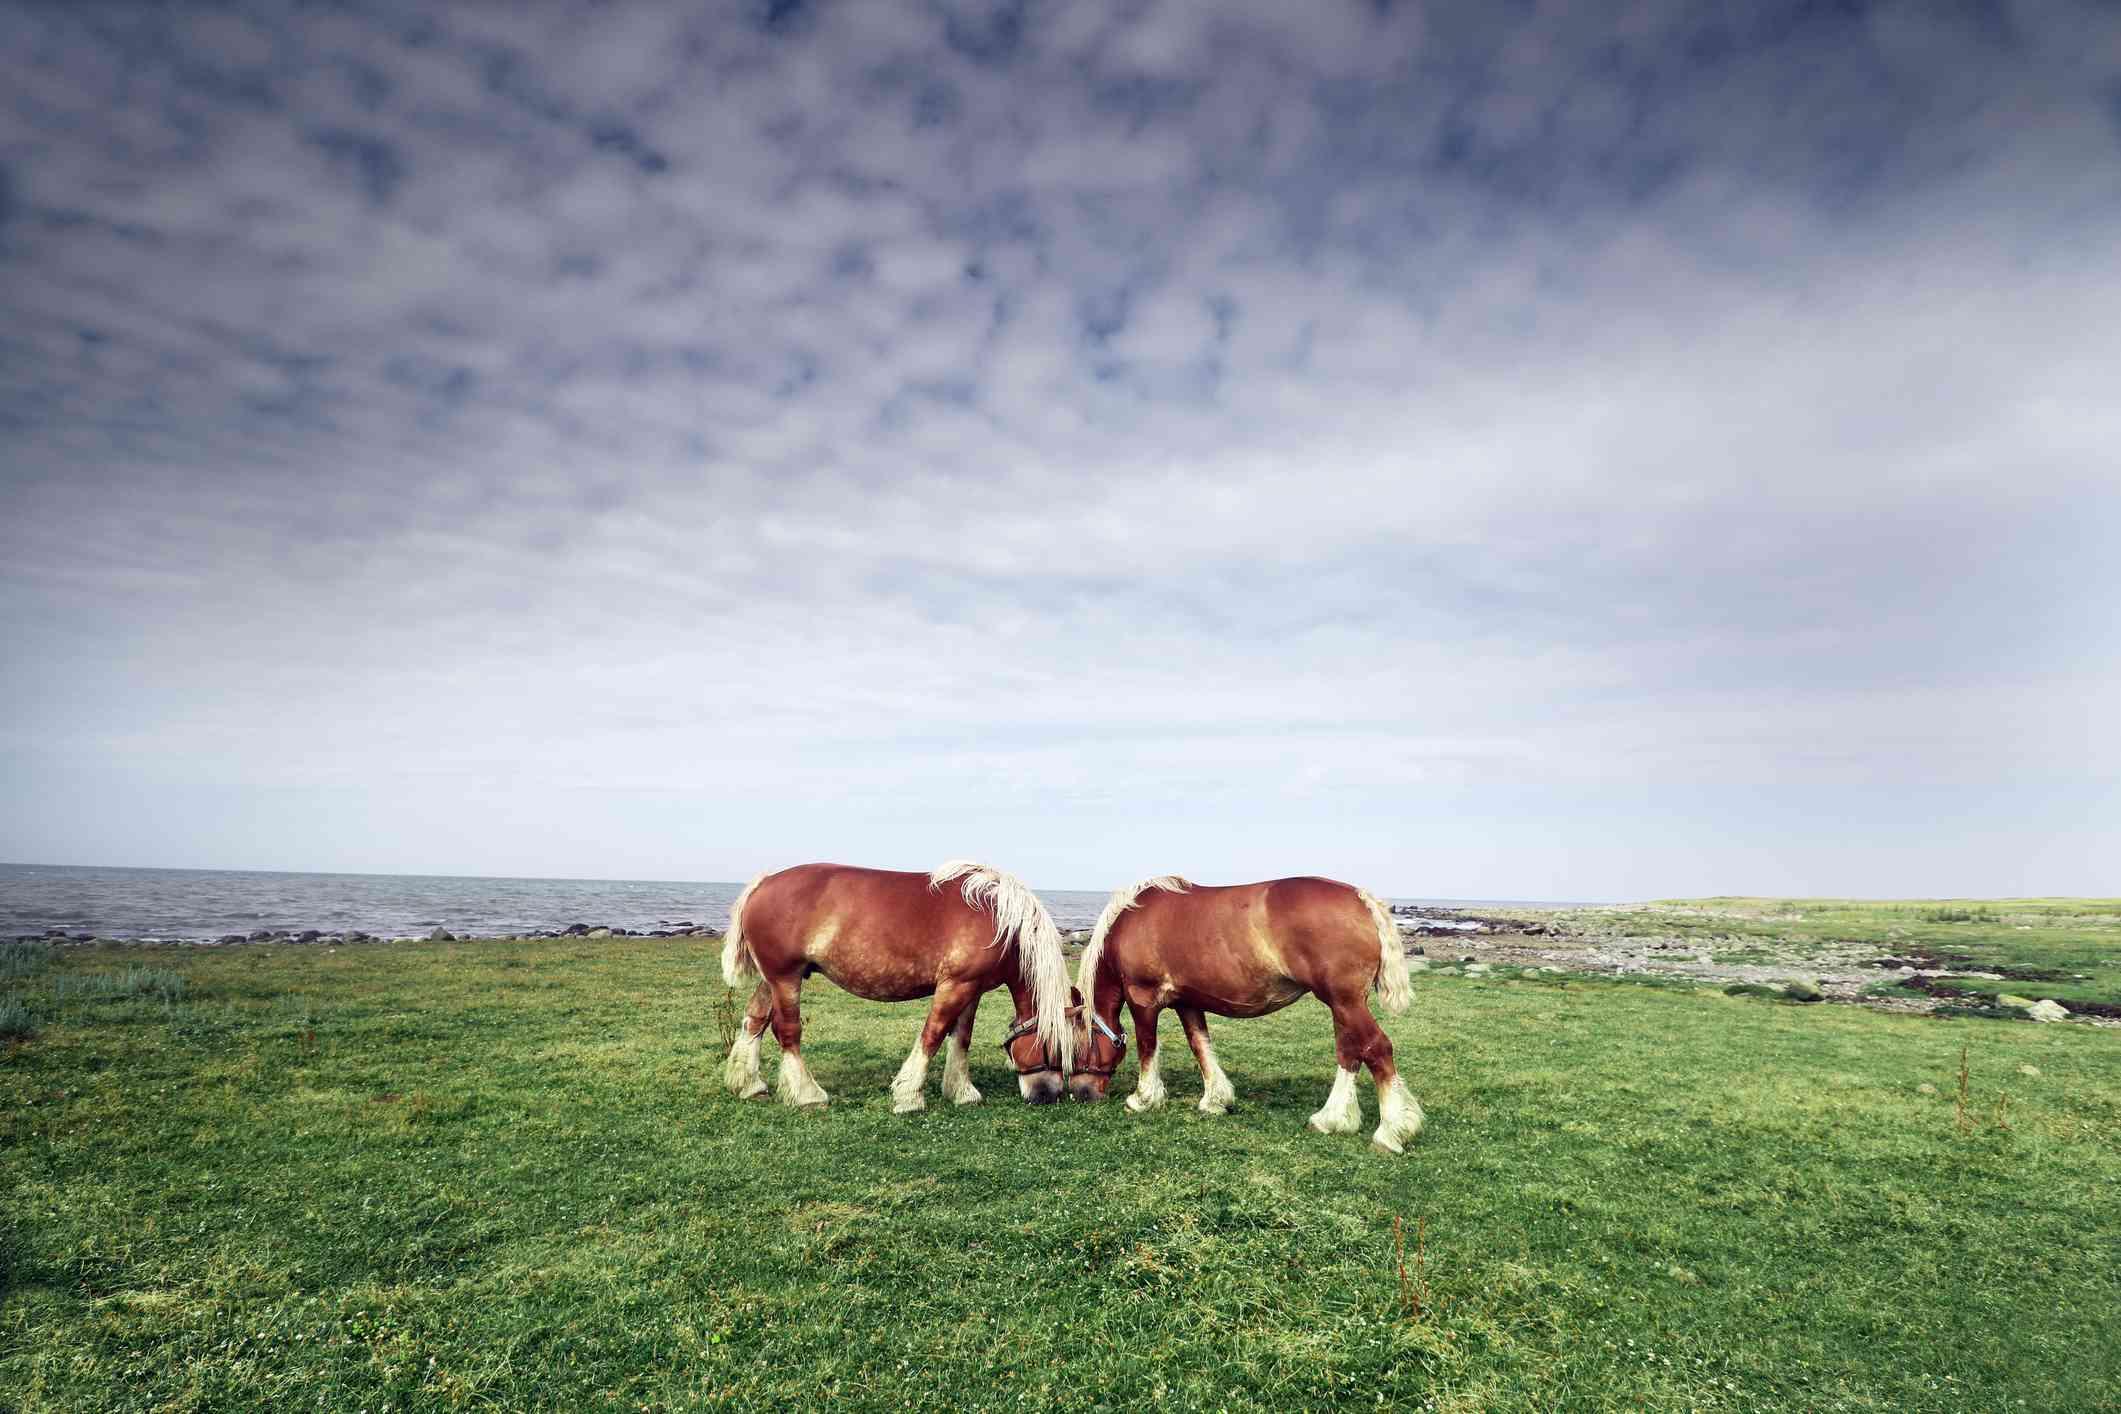 Un par de caballos Arden pastan afuera